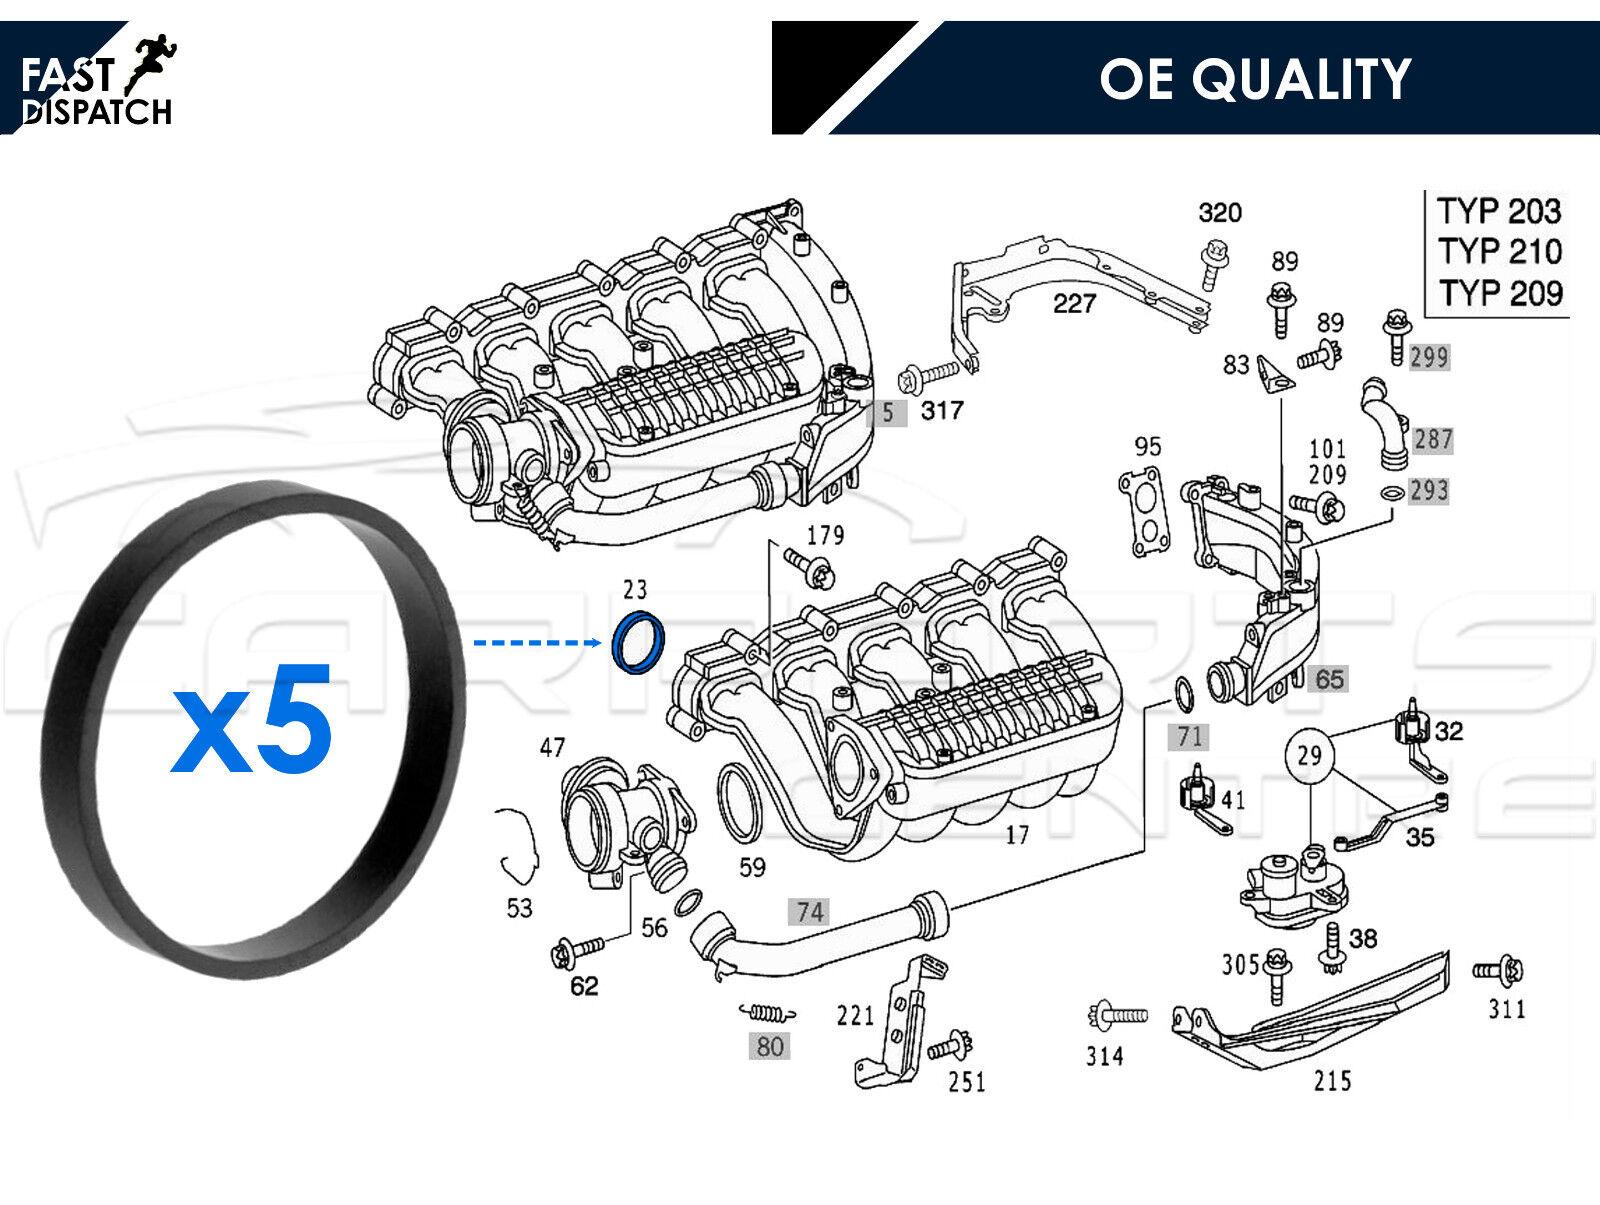 Groovy Mercedes Benz Cdi Engine Diagram Basic Electronics Wiring Diagram Wiring Digital Resources Otenewoestevosnl